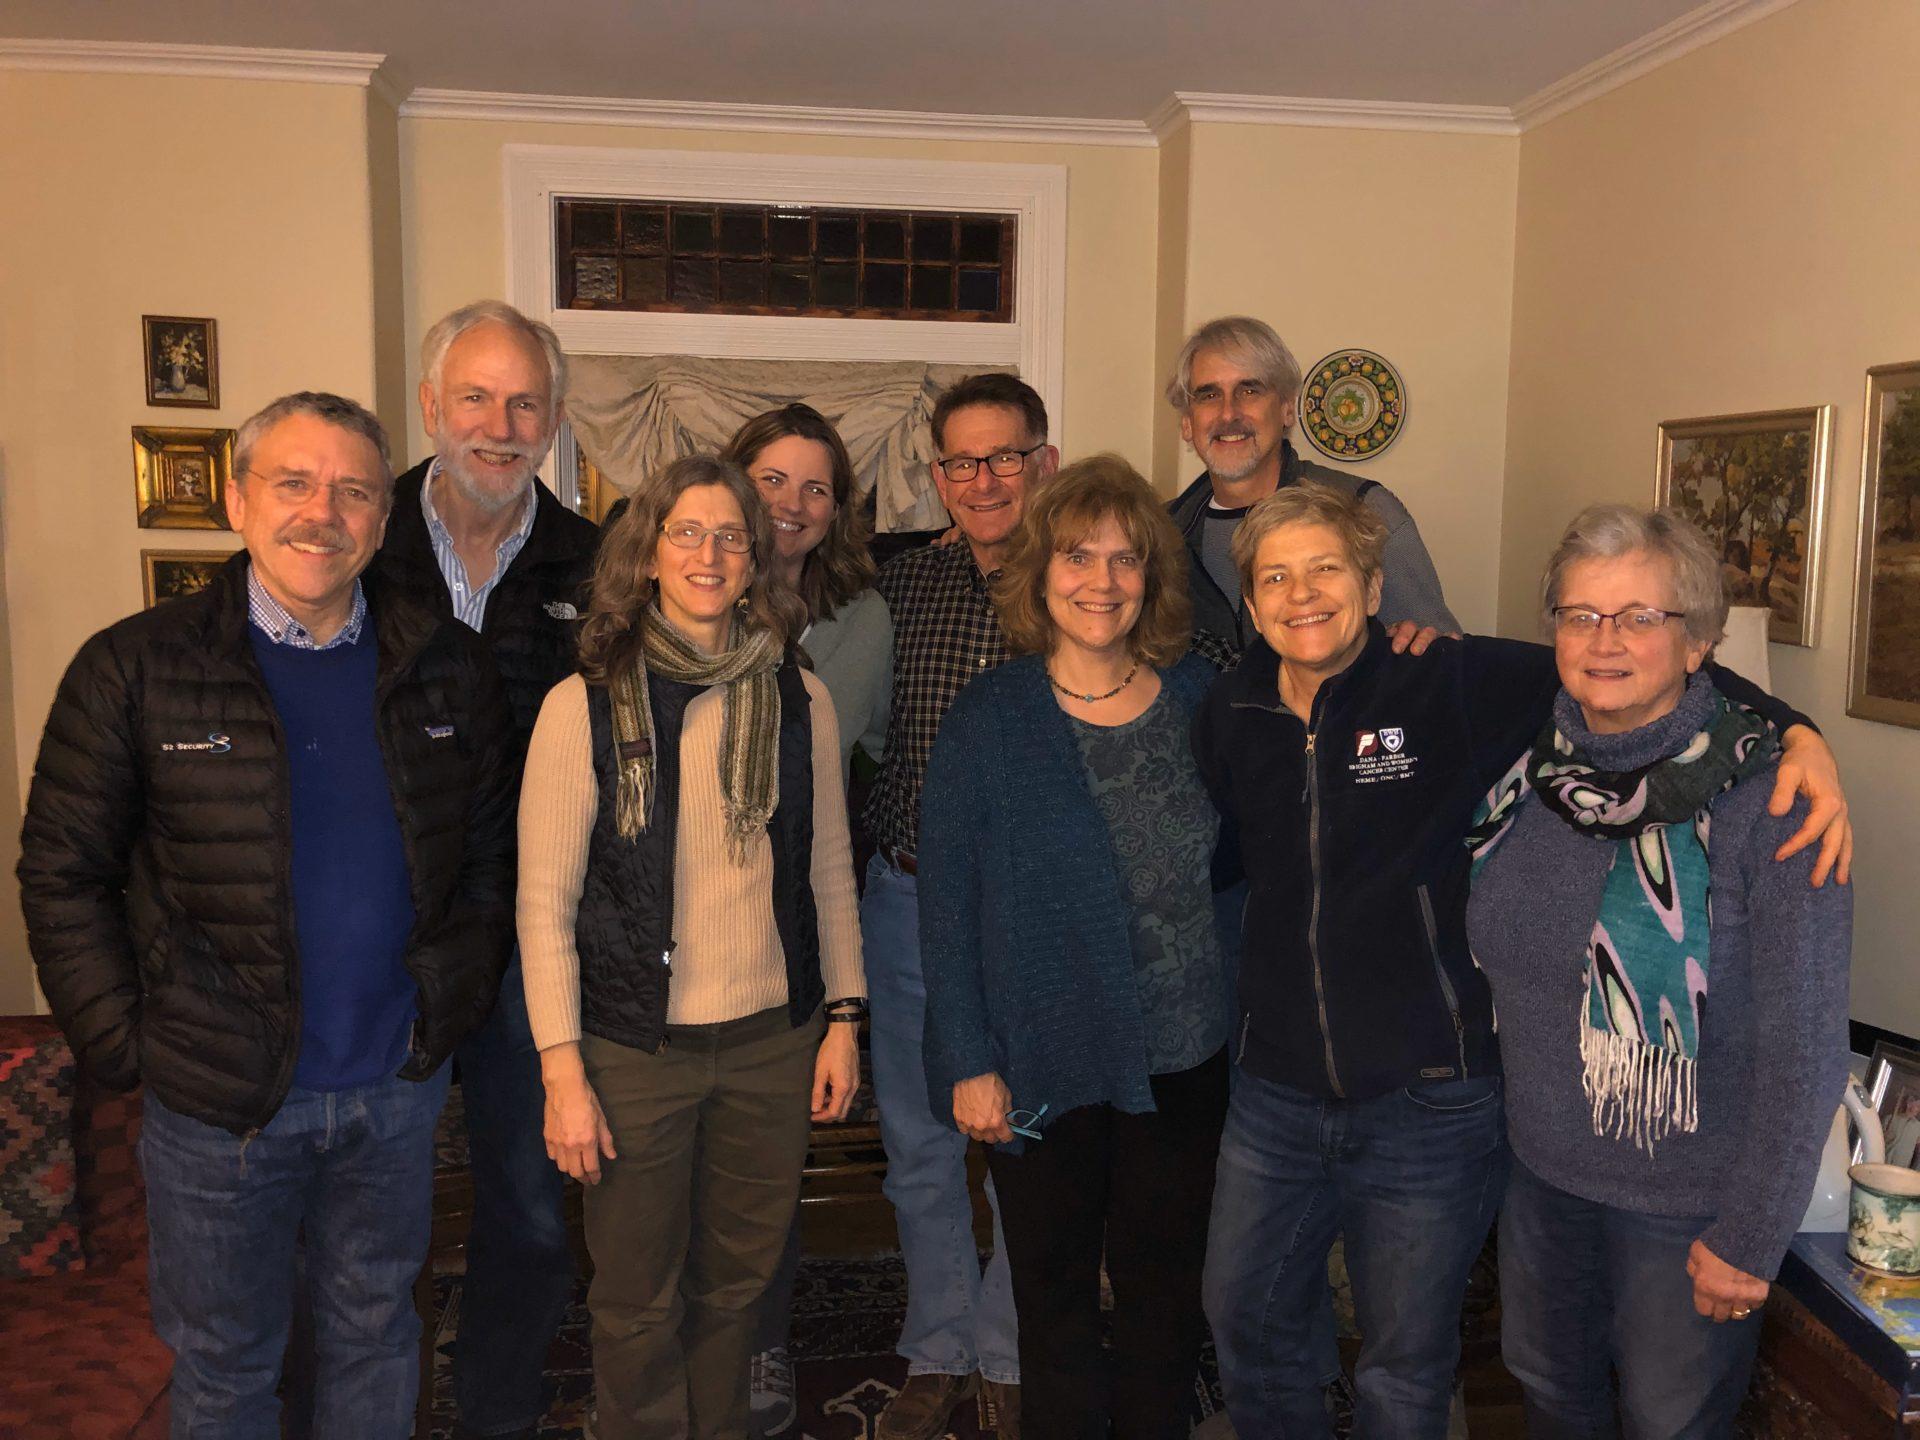 Photo of Lay Ministers: Jay Flynn, Jud Leonard, Ellen Metzger, Erin O'Donnell, Cris Goldsmith, Ann Woodbury, Gordon Moriarty, Margaret Costello, Cindy Orrell